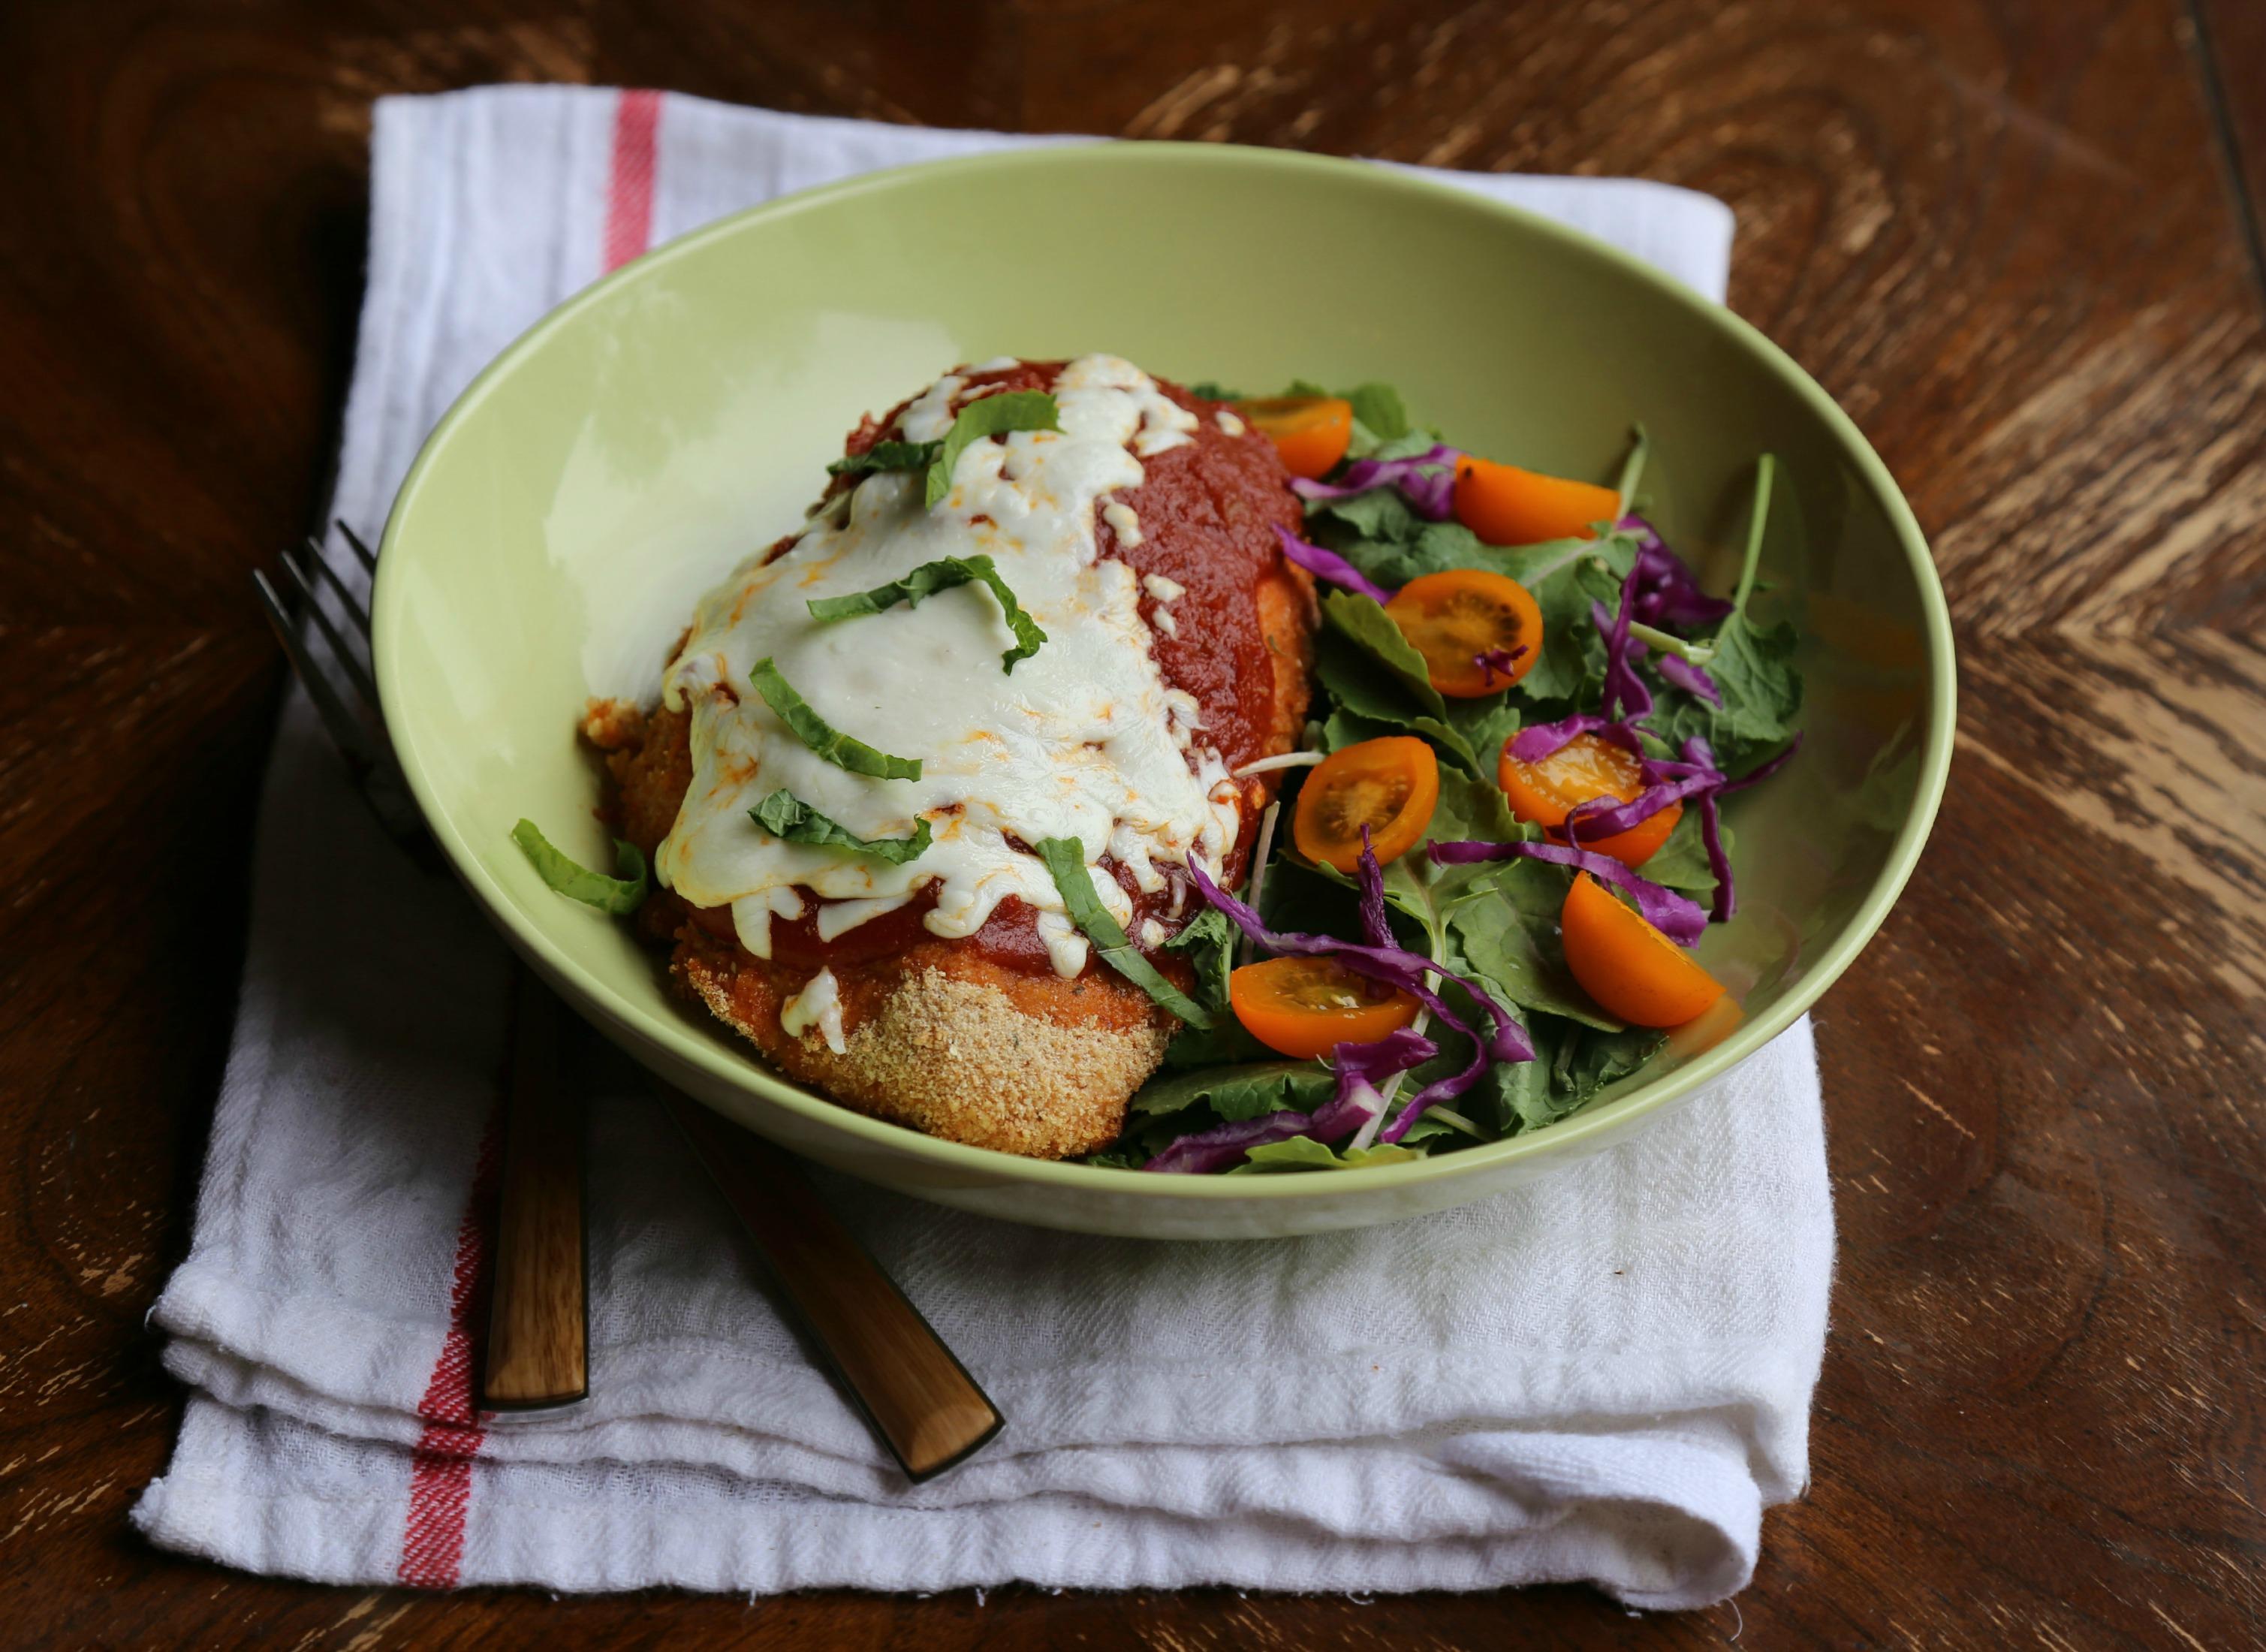 oven-baked-chicken-parm-recipe-VianneyRodriguez-sweetlifebake